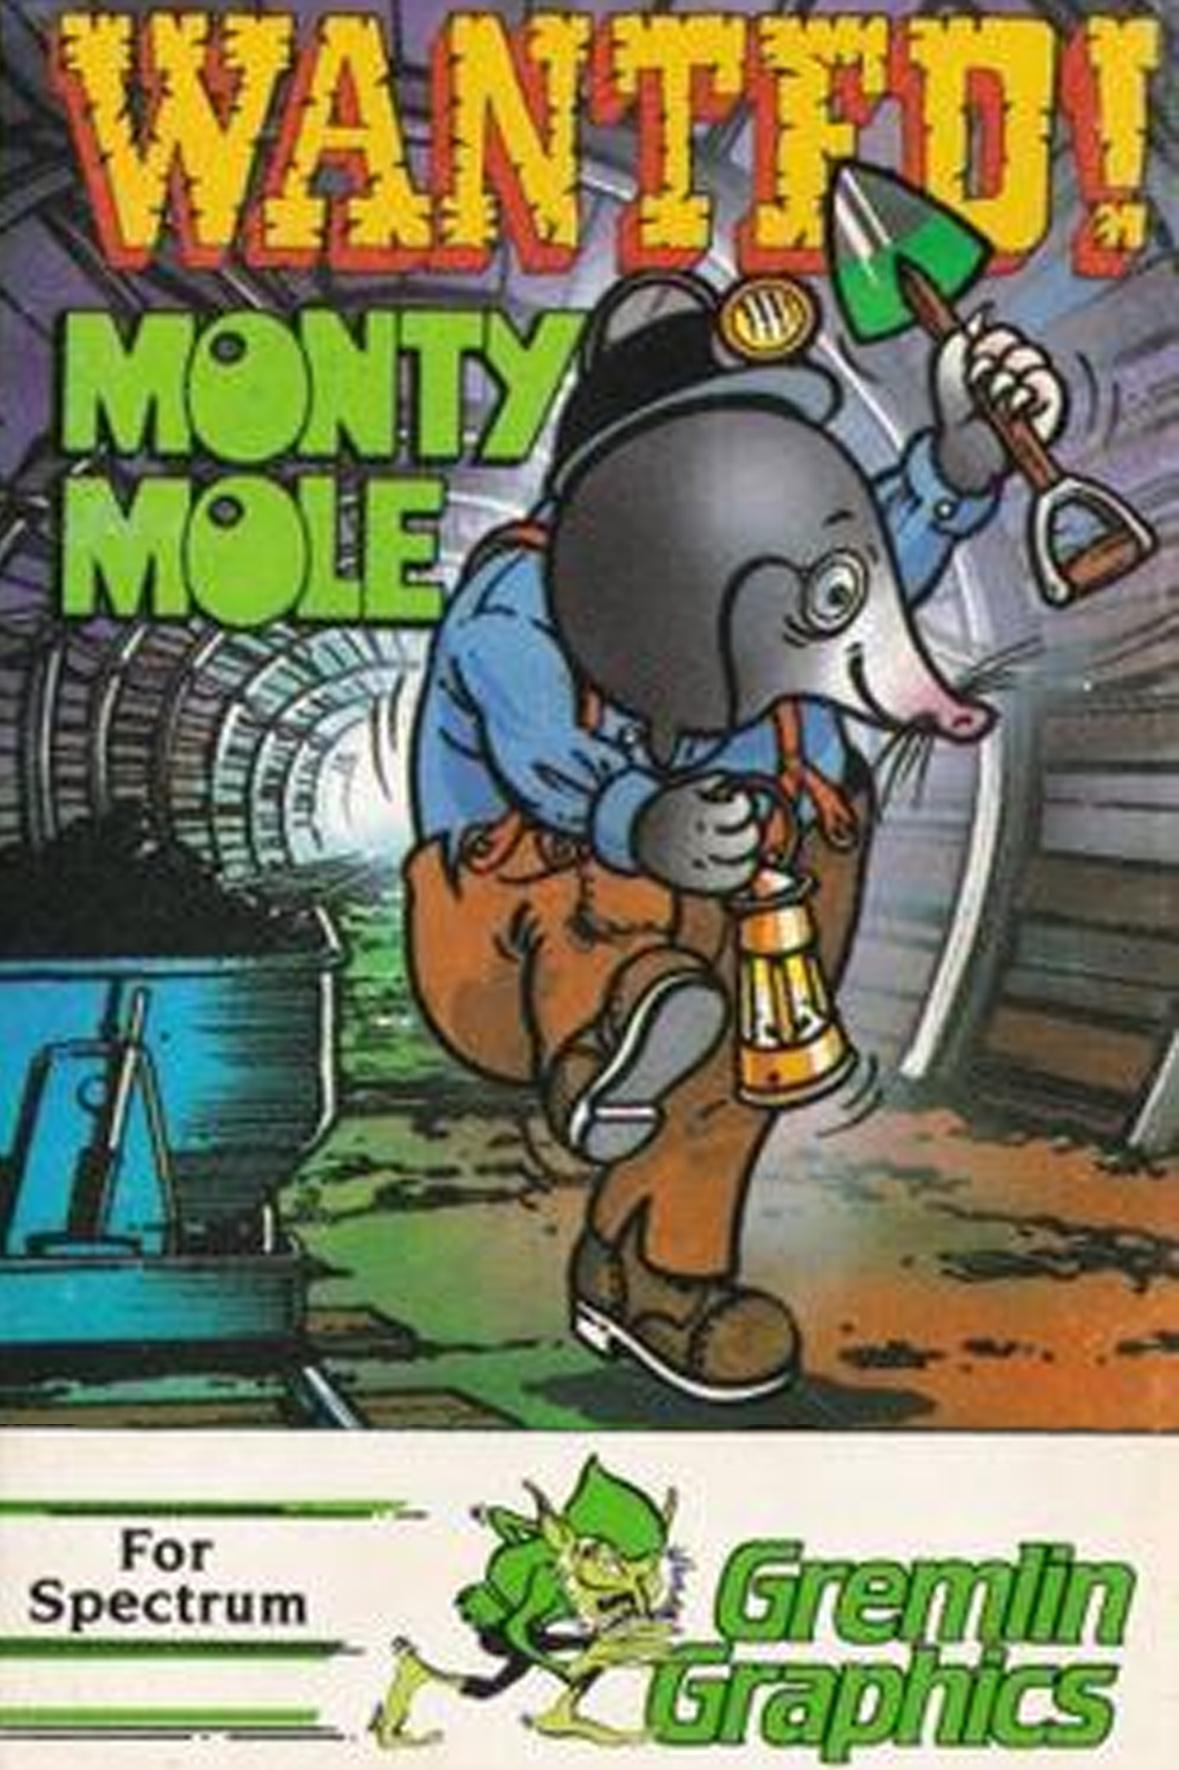 Wanted: Monty Mole  | RBG